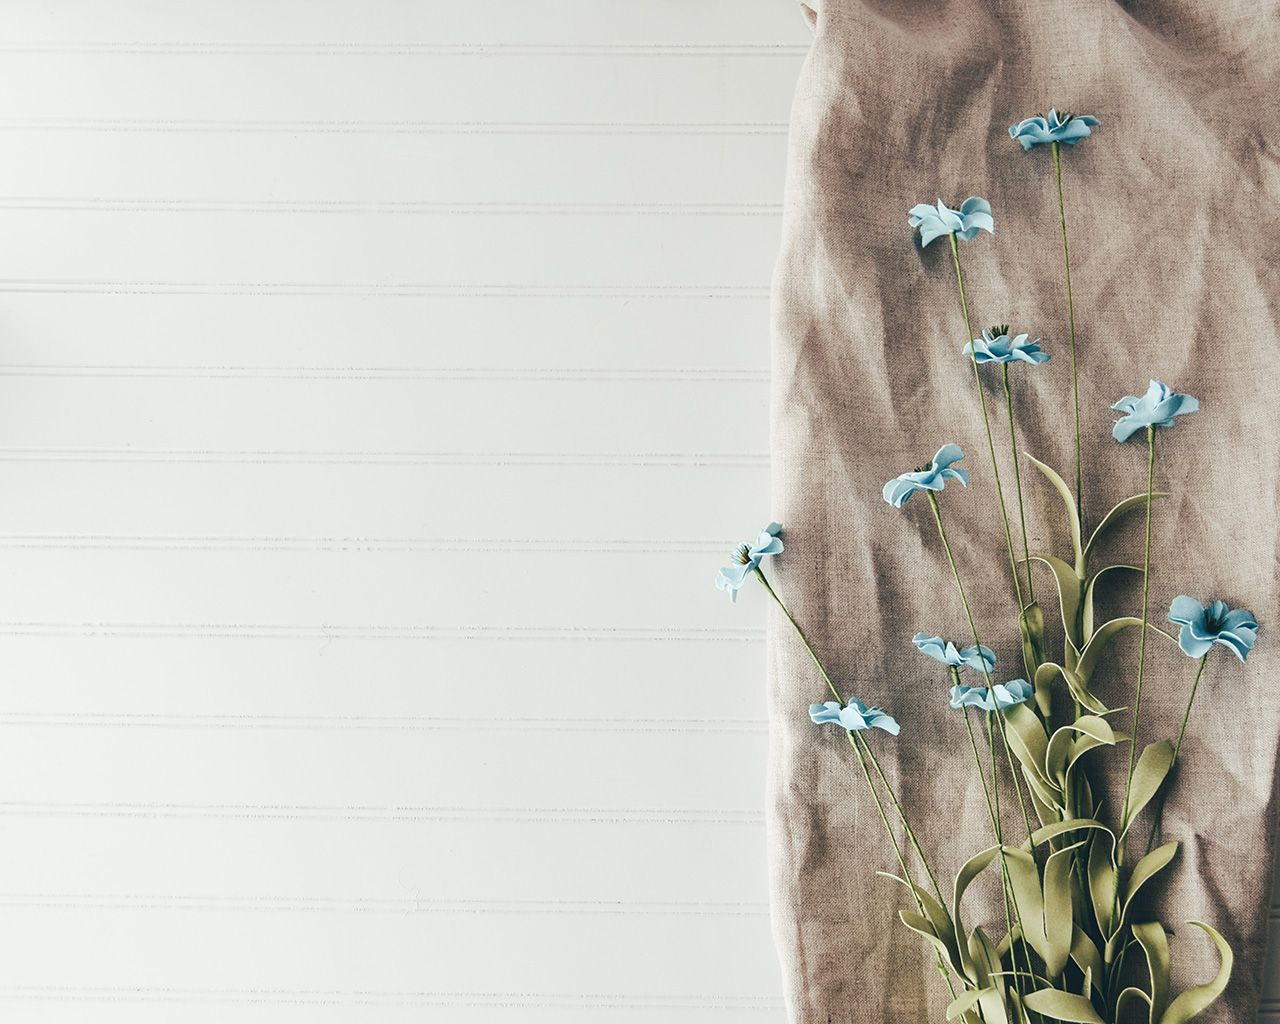 اجمل صور خلفيات هادئه فوتوشوب للتصميم Hd فيو تطوير الأعمال Natural Fabrics Fabric Pictures Plant Images